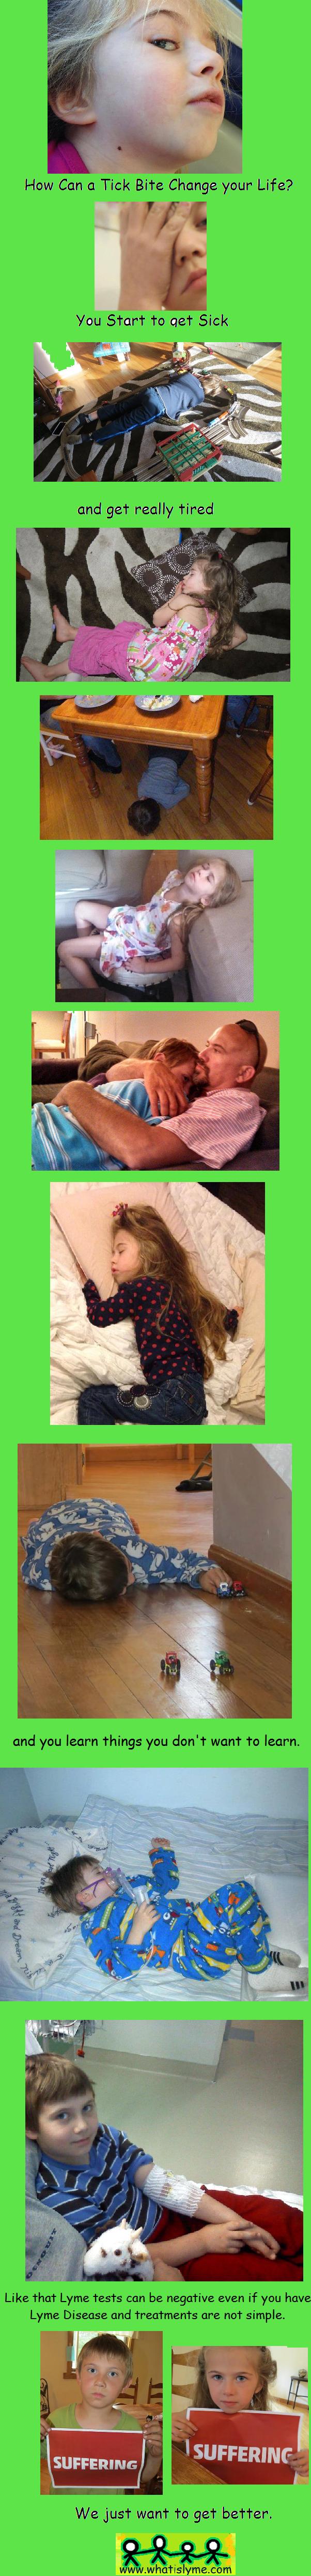 Kids with Lyme Disease